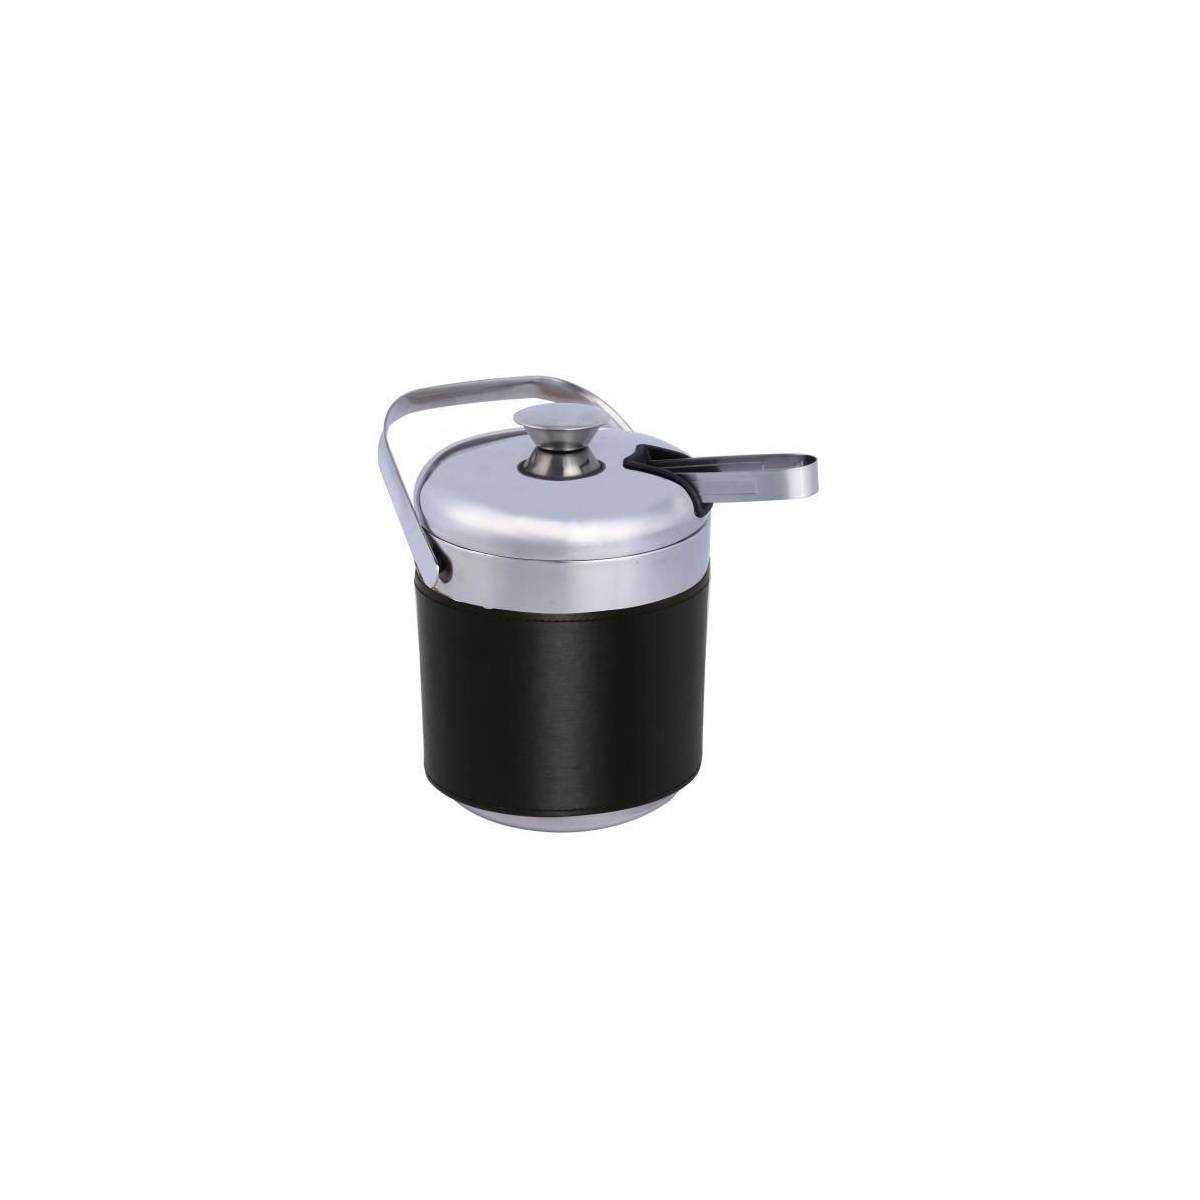 Ведро для льда 1л (черное) (8991030 BK) 8991030 BK JVD